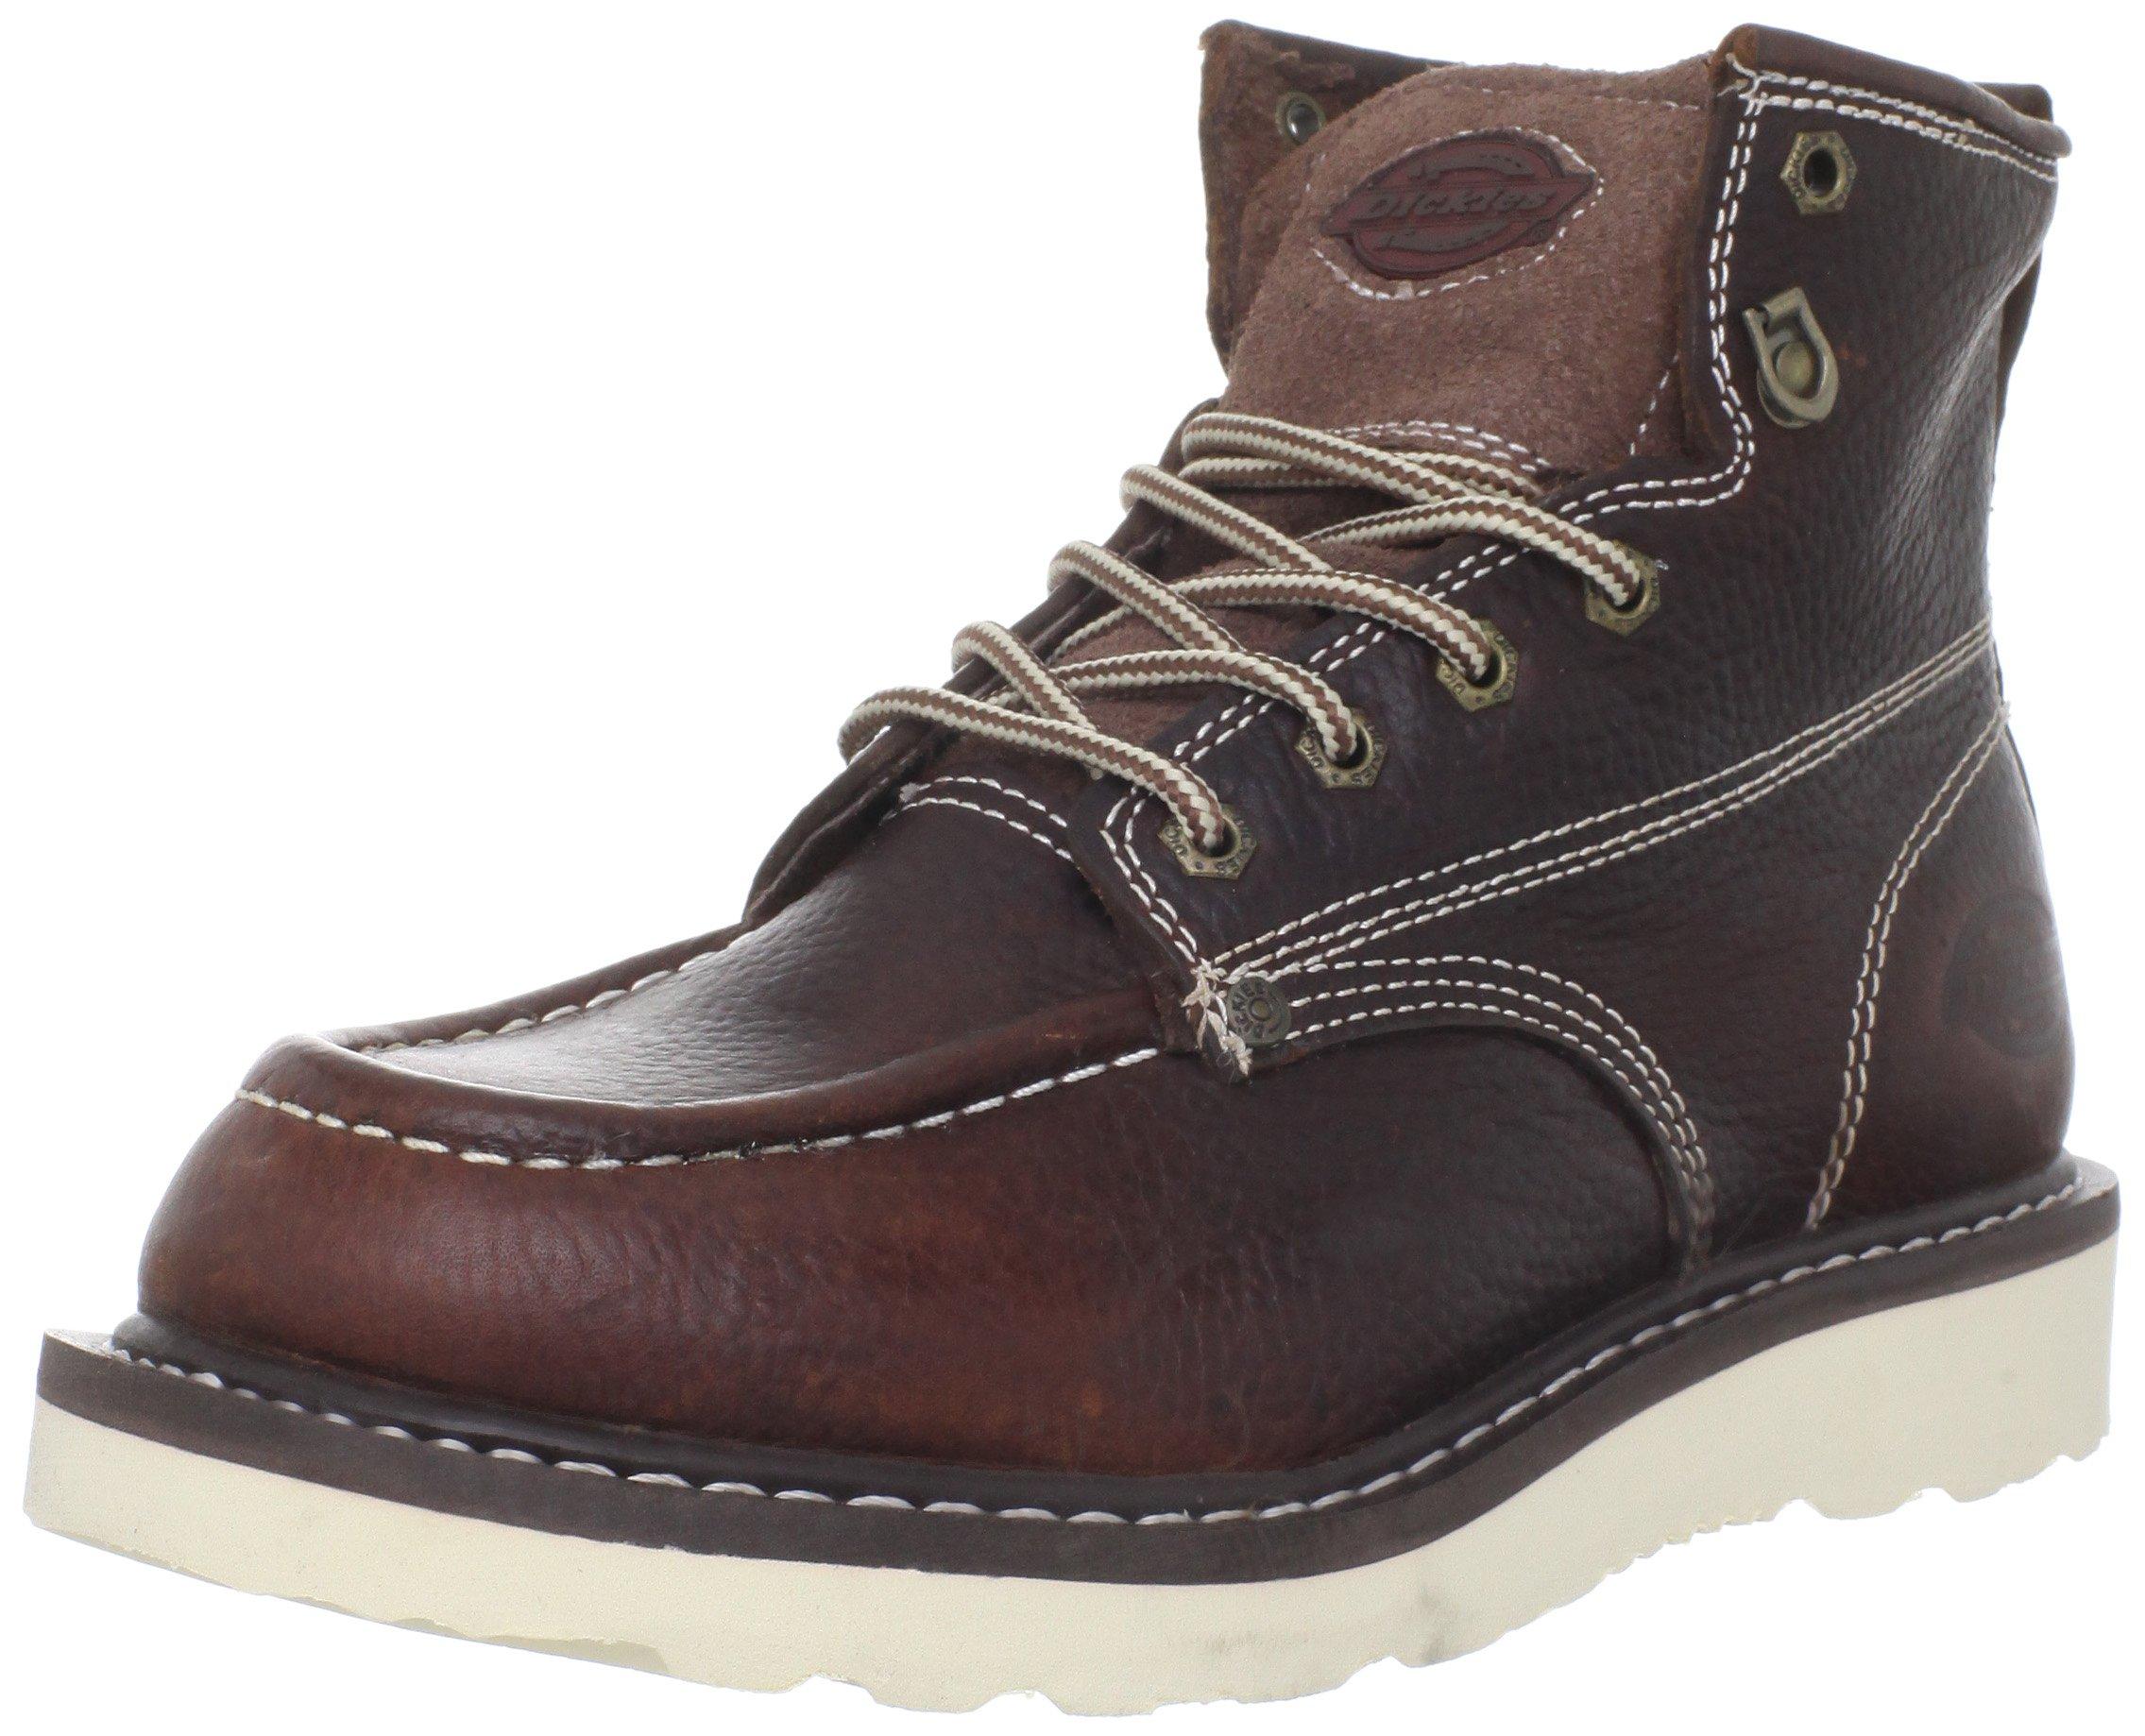 Dickies Men's Trader 6'' Leather Boot,Burgandy,9 M US by Dickies